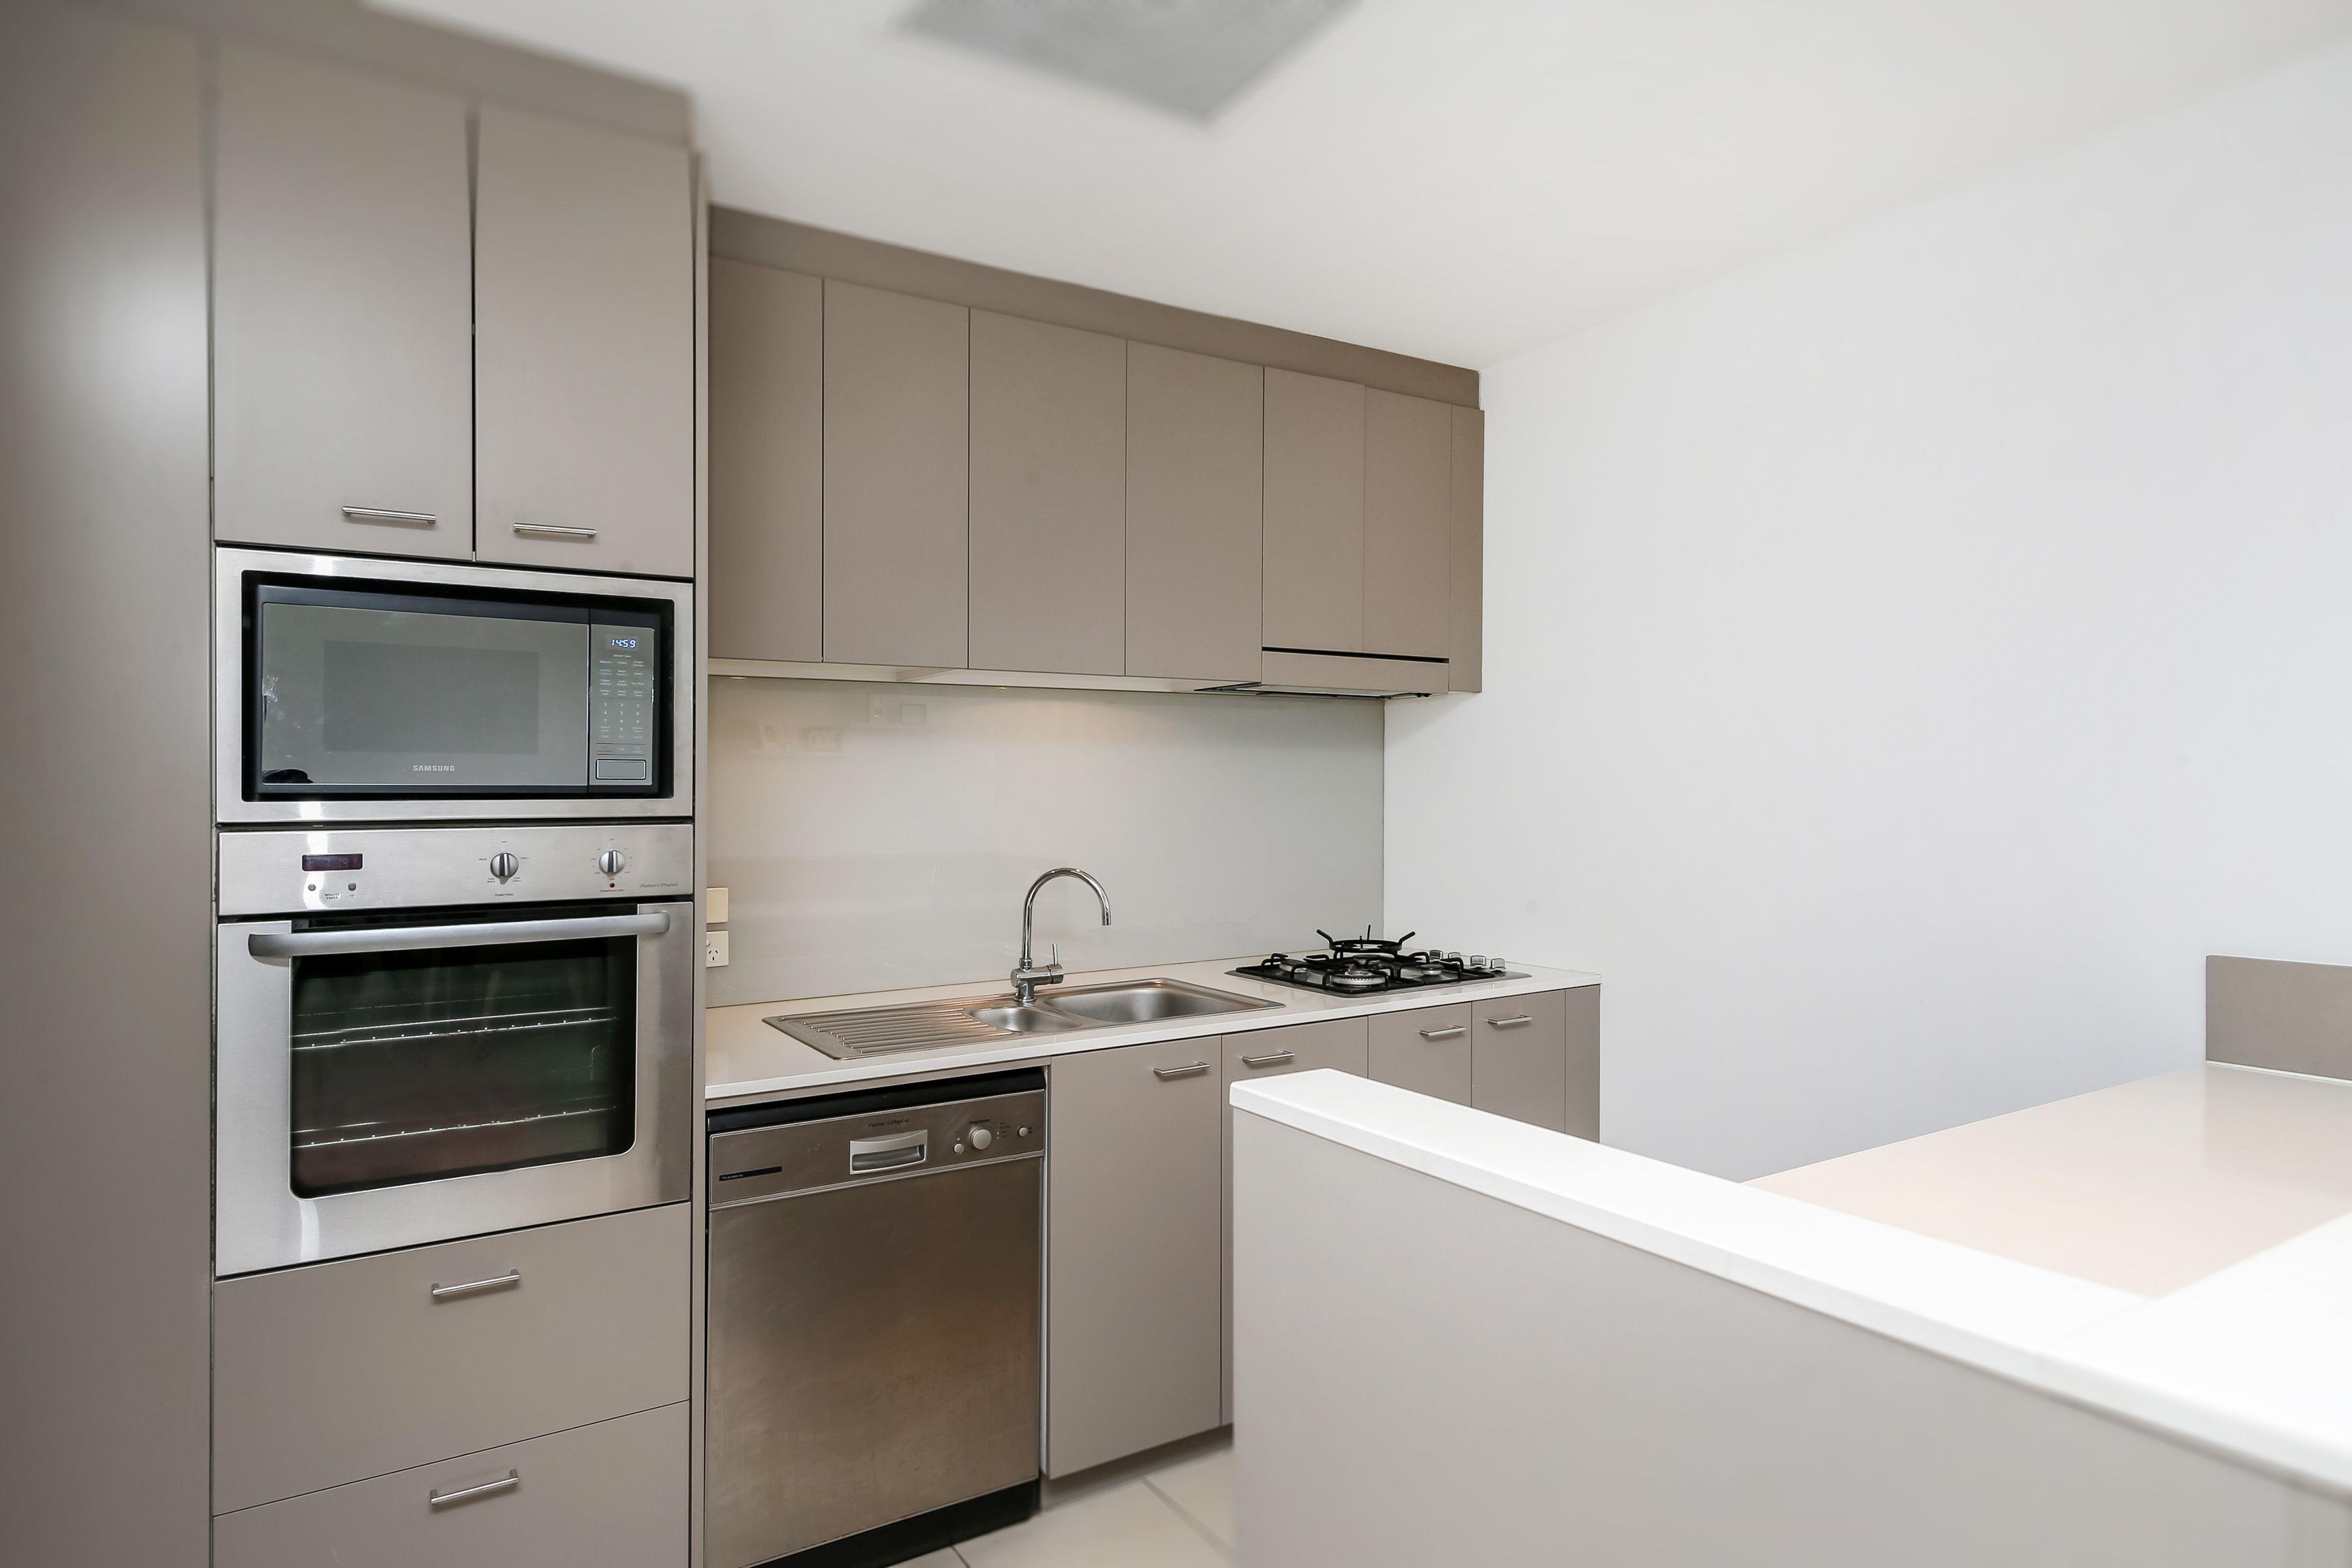 Uncategorized Kitchen Appliances Newcastle 505 2 honeysuckle drive newcastle nsw 2300 for sale kitchen sale